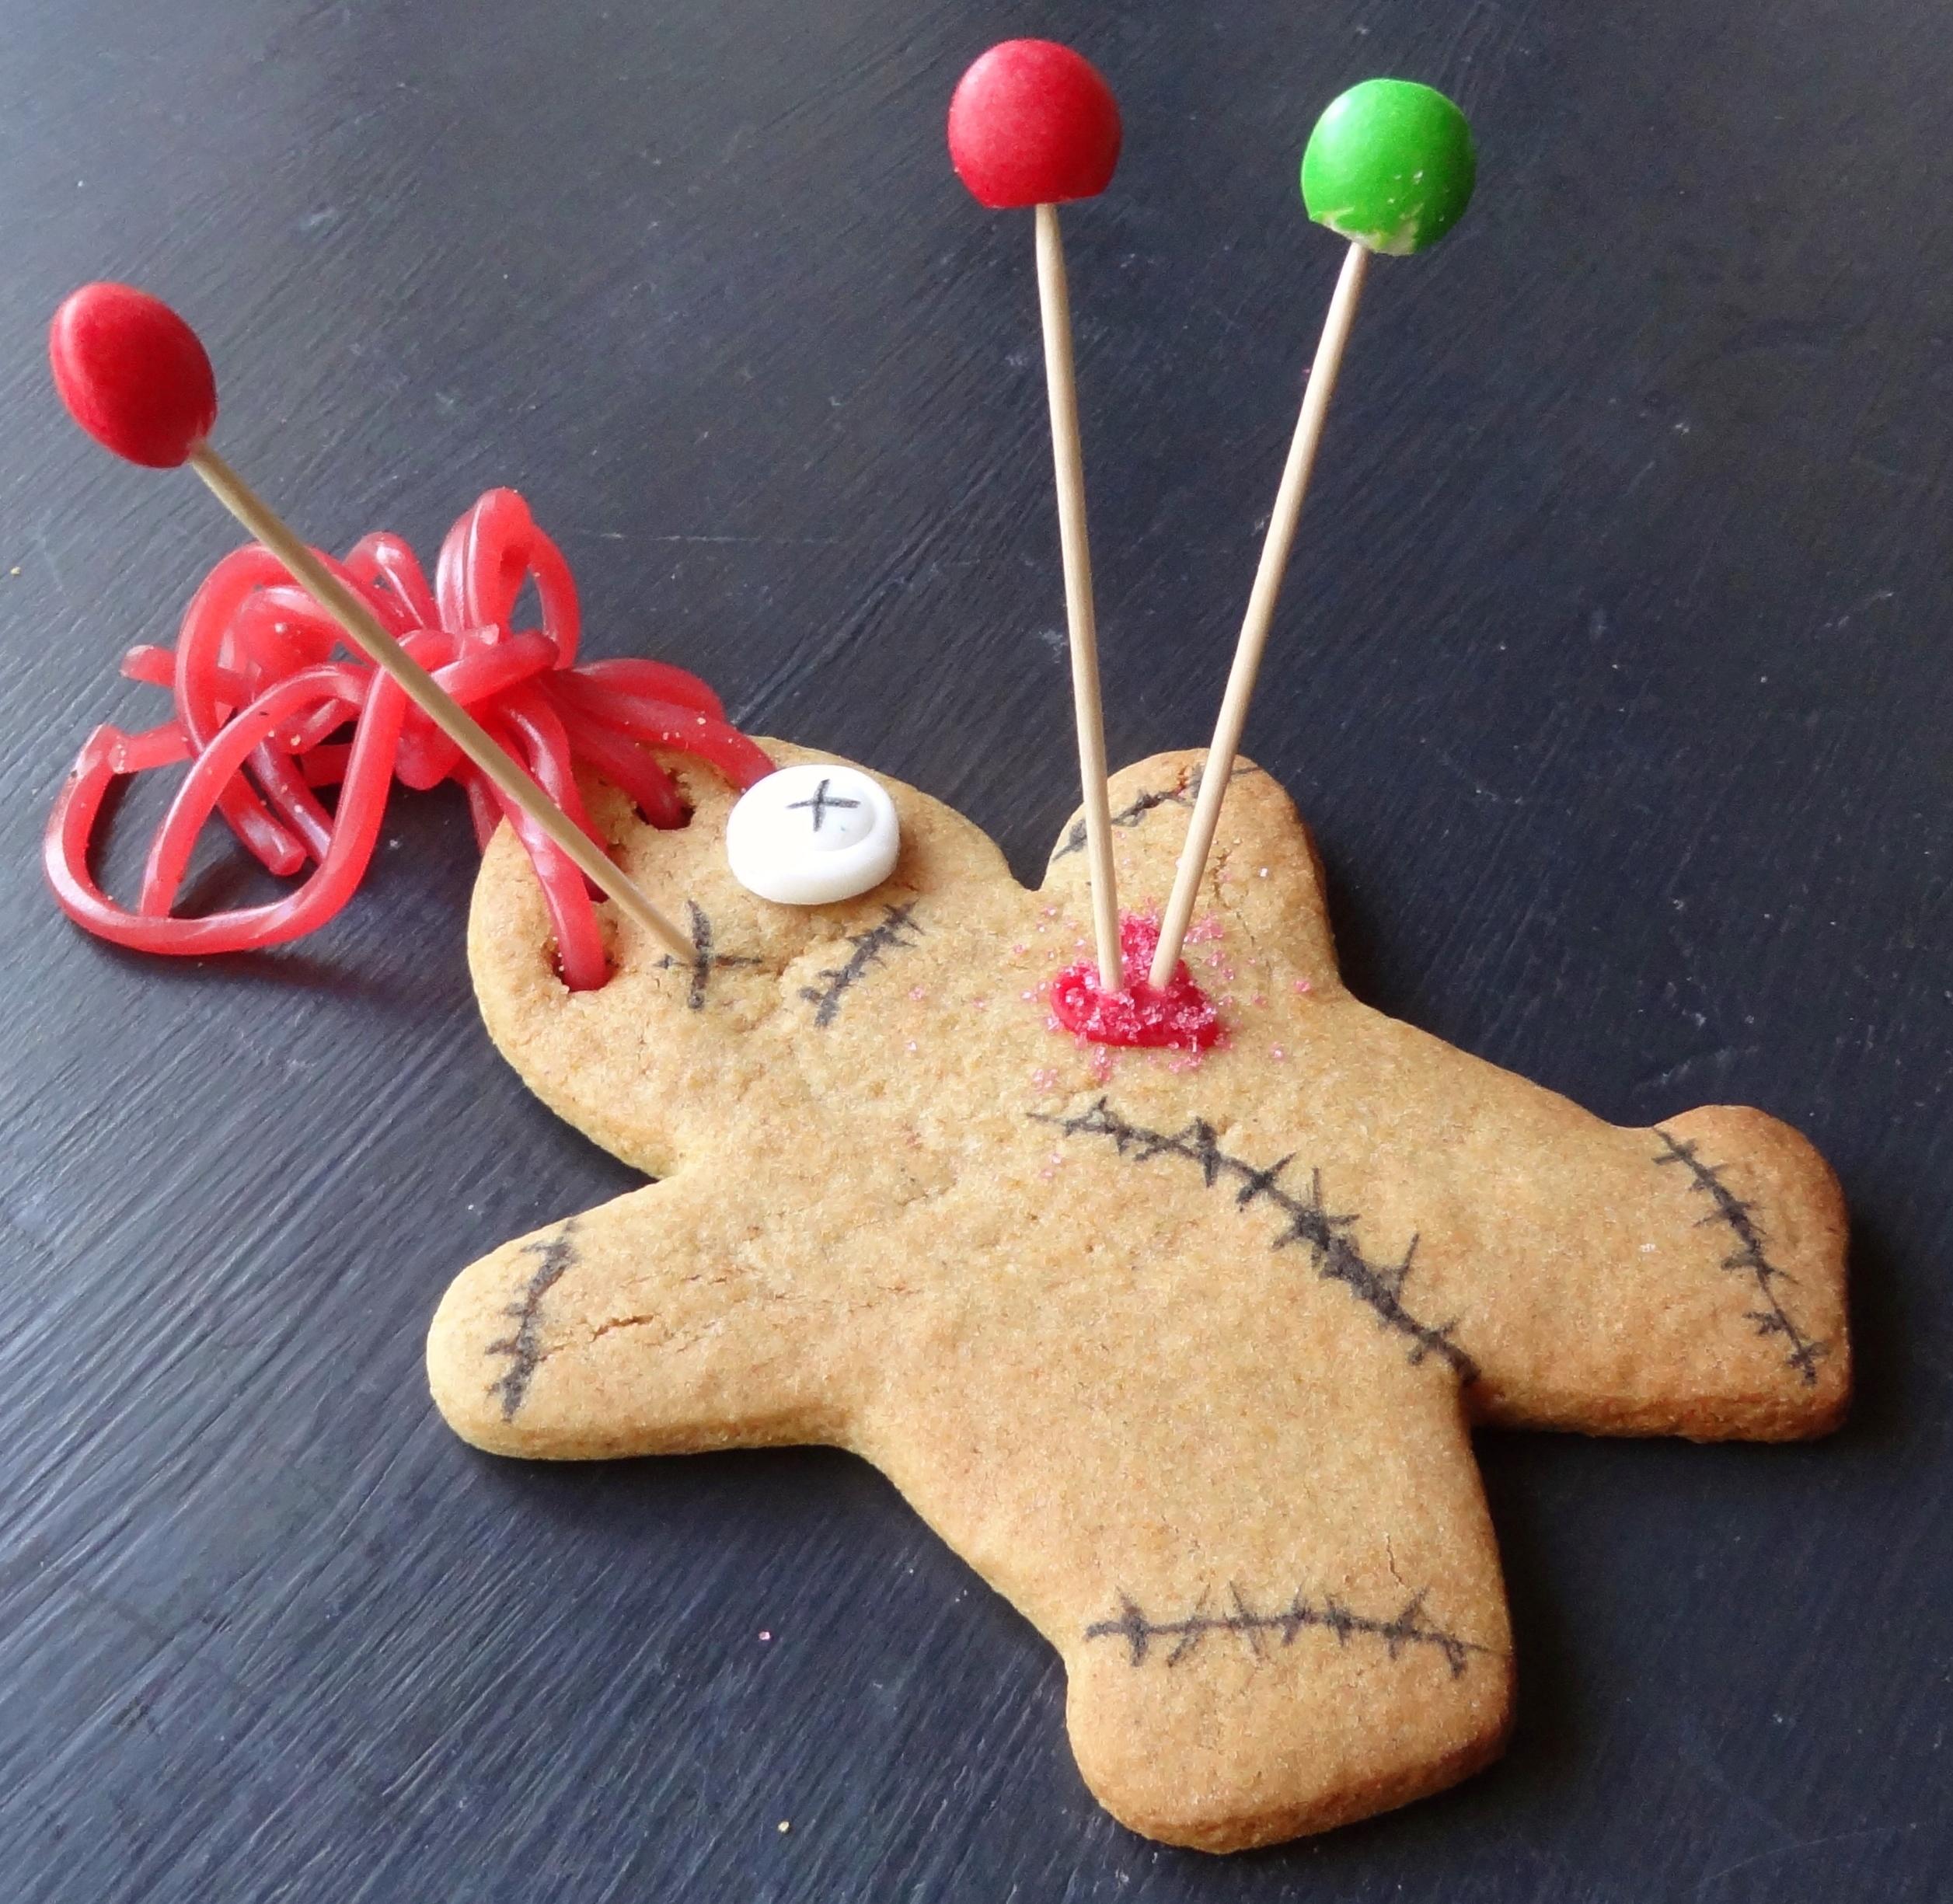 Gingerdead Men - Voodoo Doll Gingerbread Men - Domestic Gothess